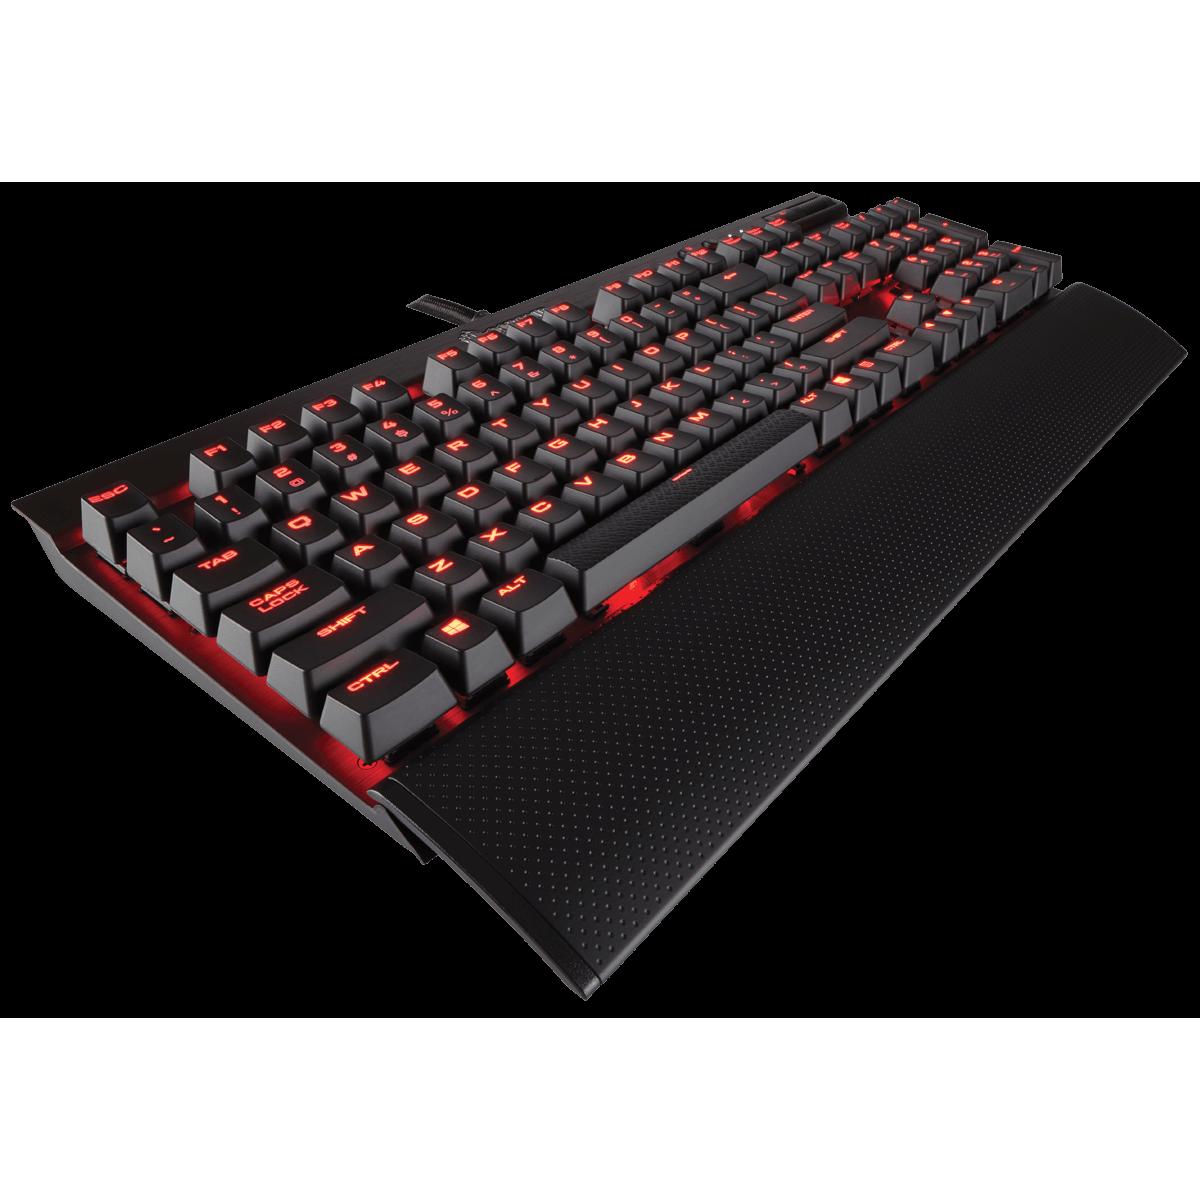 Teclado Mecânico Gamer Corsair K70 LUX, Switch Cherry MX Brown, CH-9101022-NA